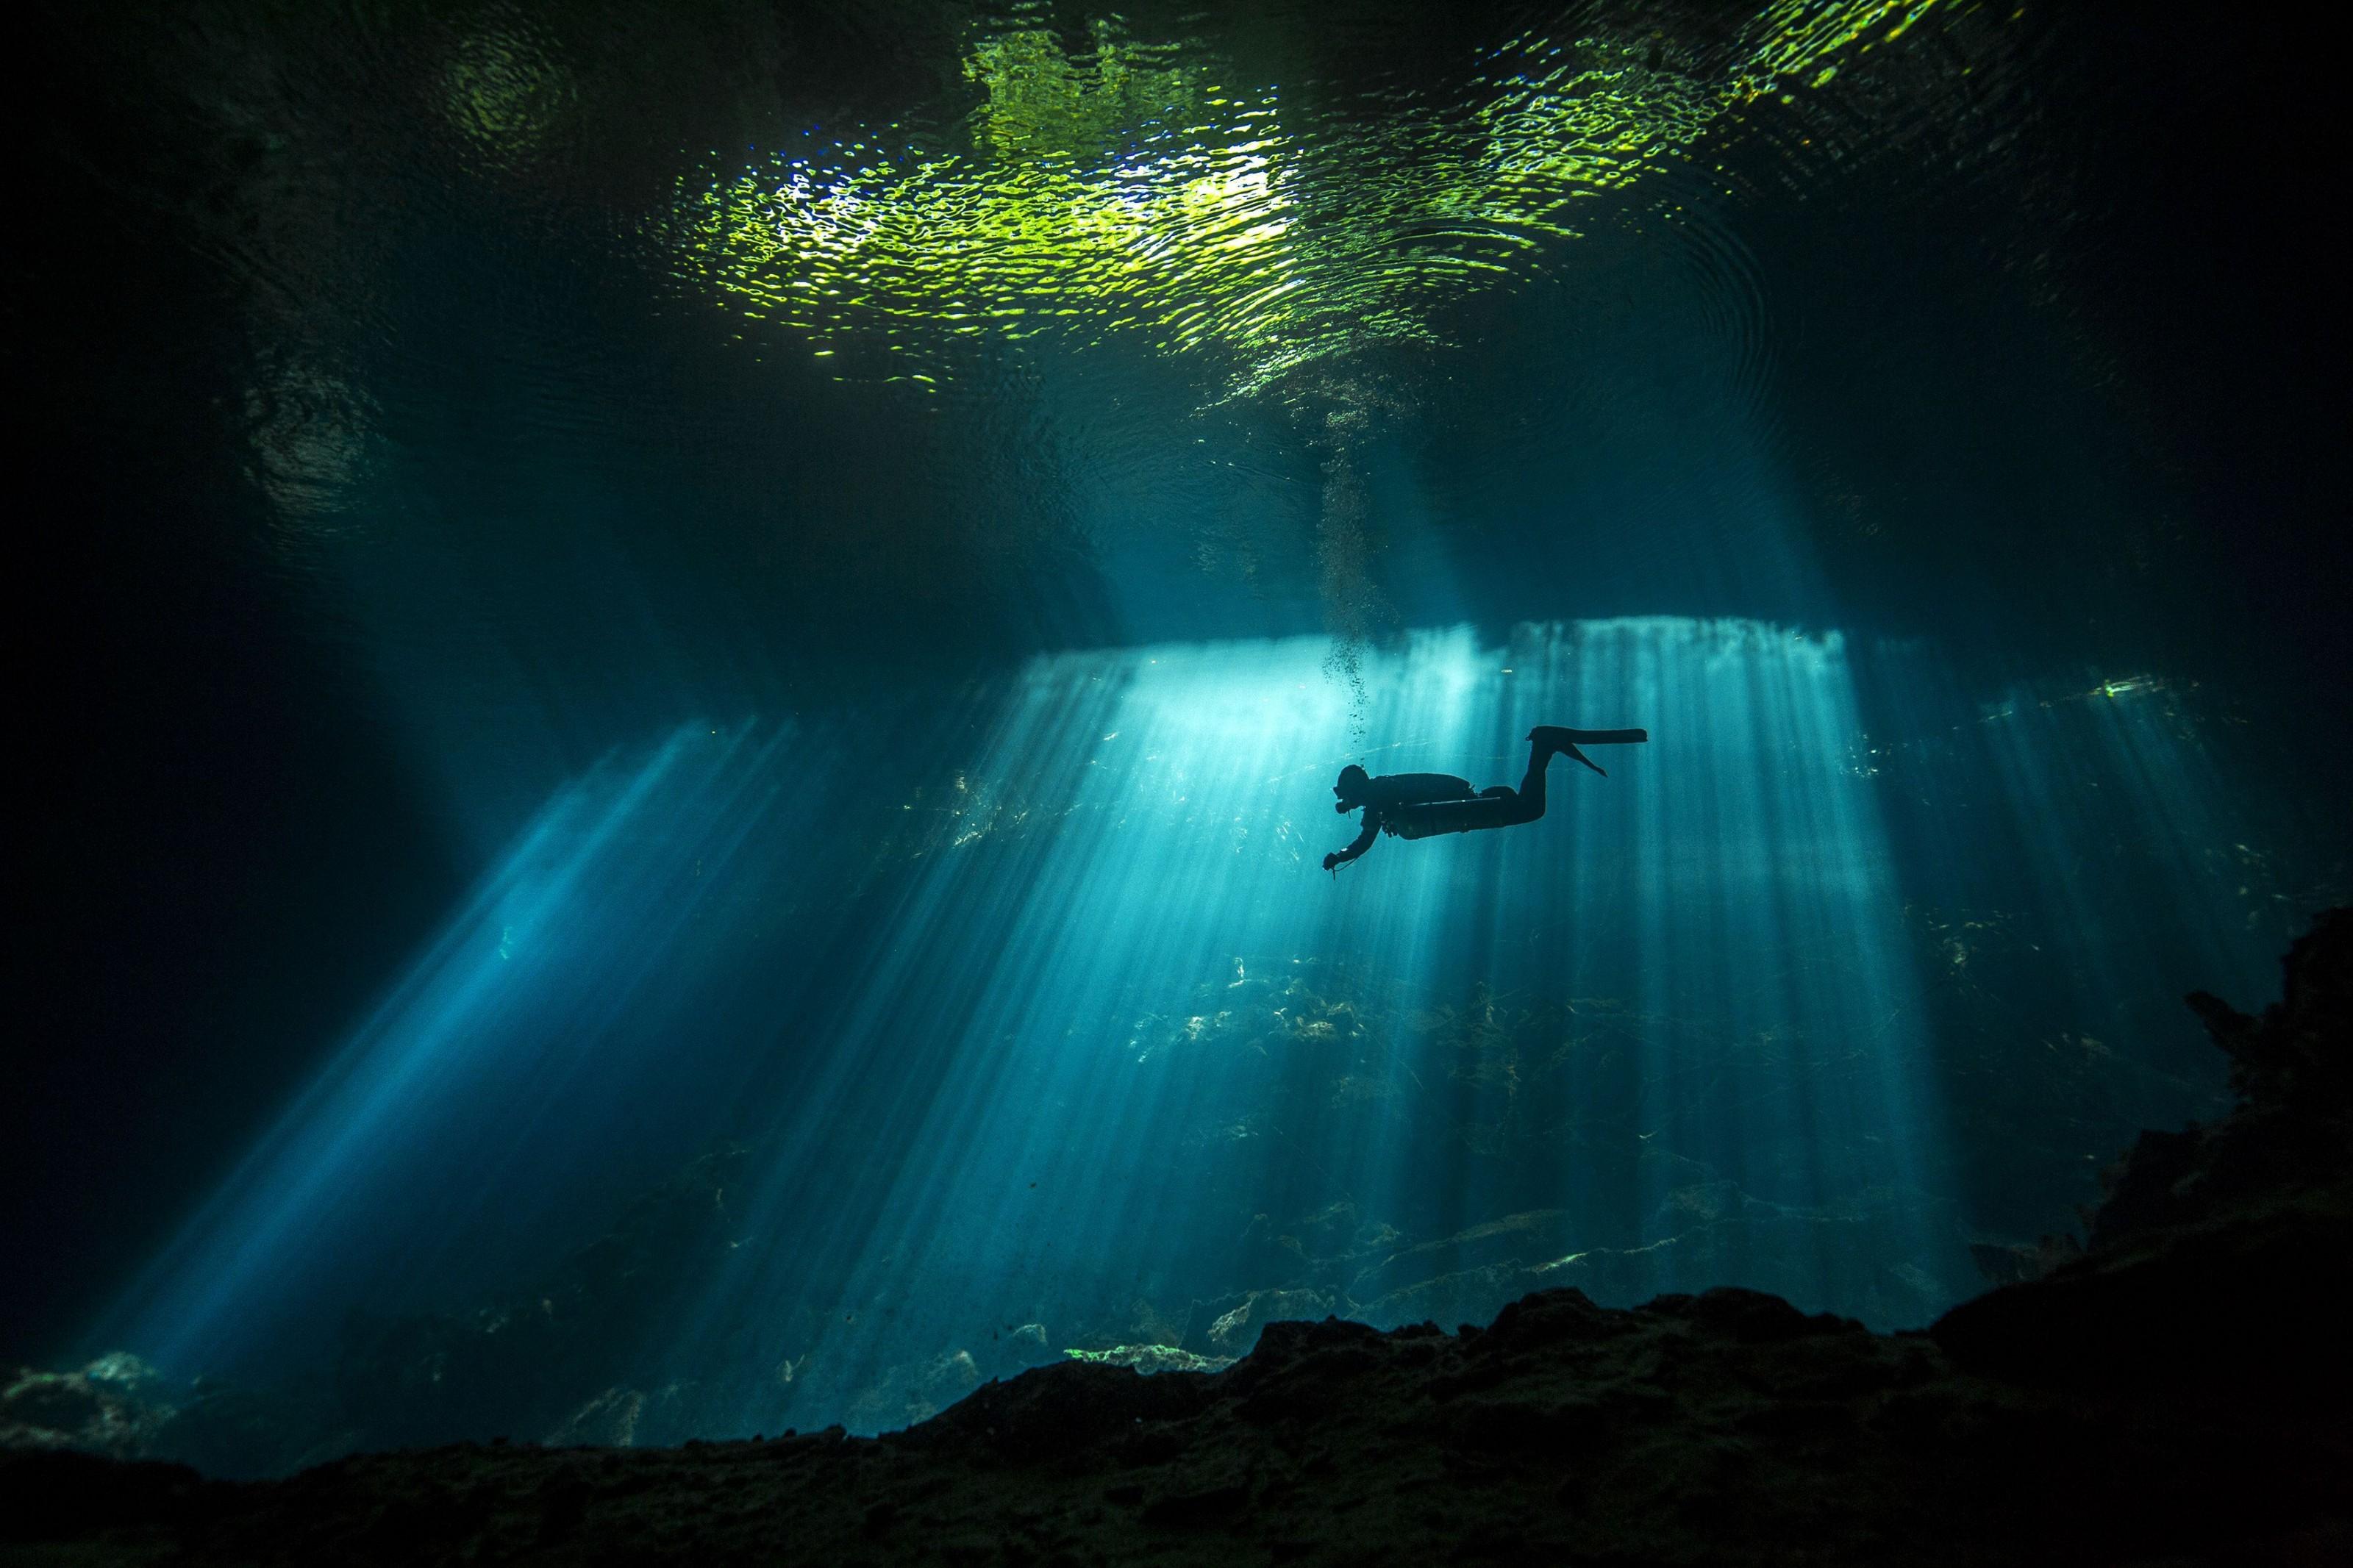 Mergulho iluminado